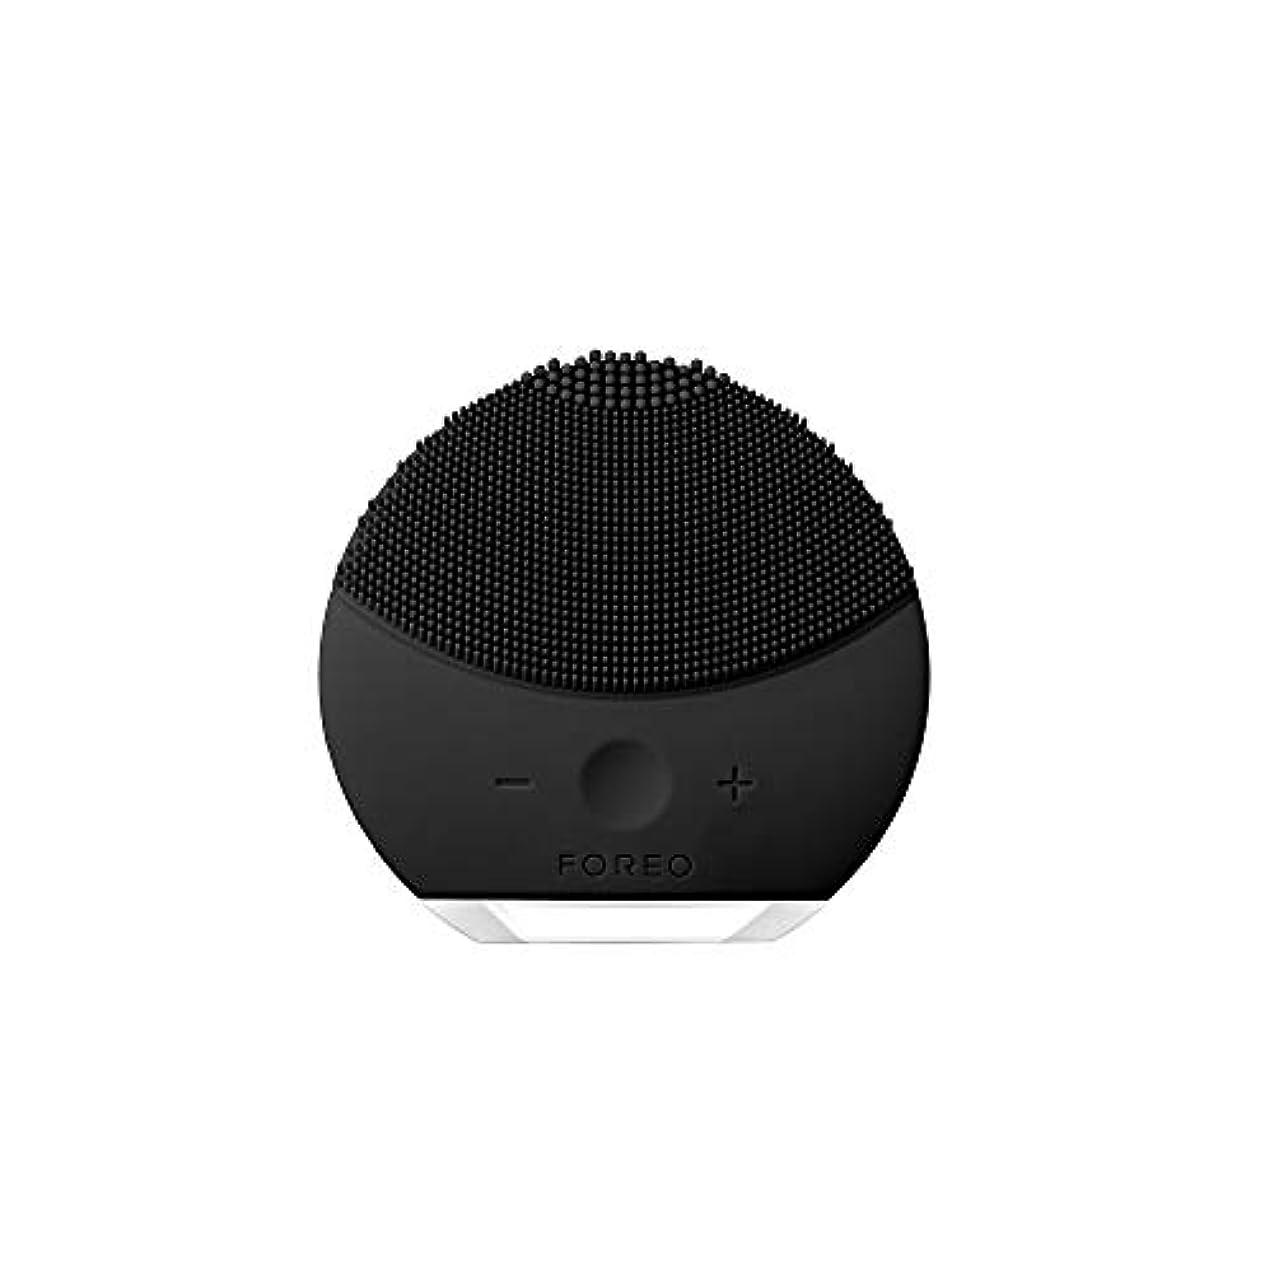 FOREO LUNA mini 2 ミッドナイト 電動洗顔ブラシ シリコーン製 音波振動